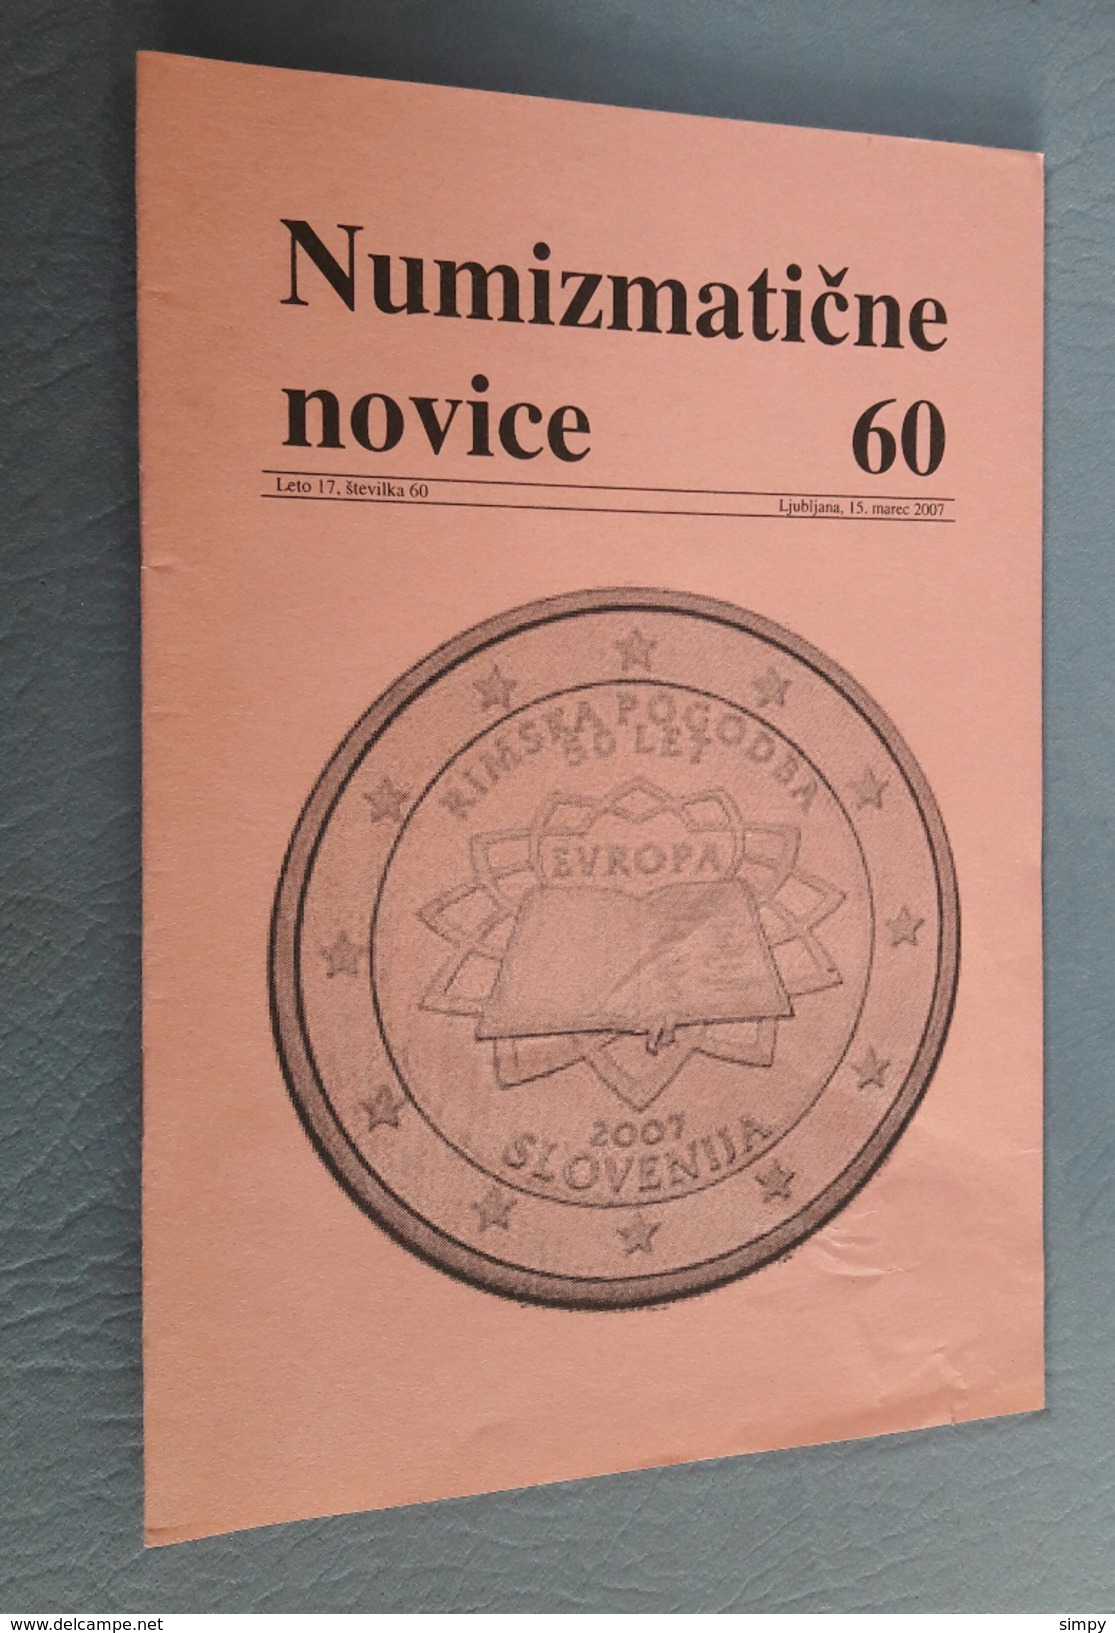 Slovenia Numismatic Bulletin Numizmaticne Novice 60 Ljubljana 2007 - Sonstige Sprachen